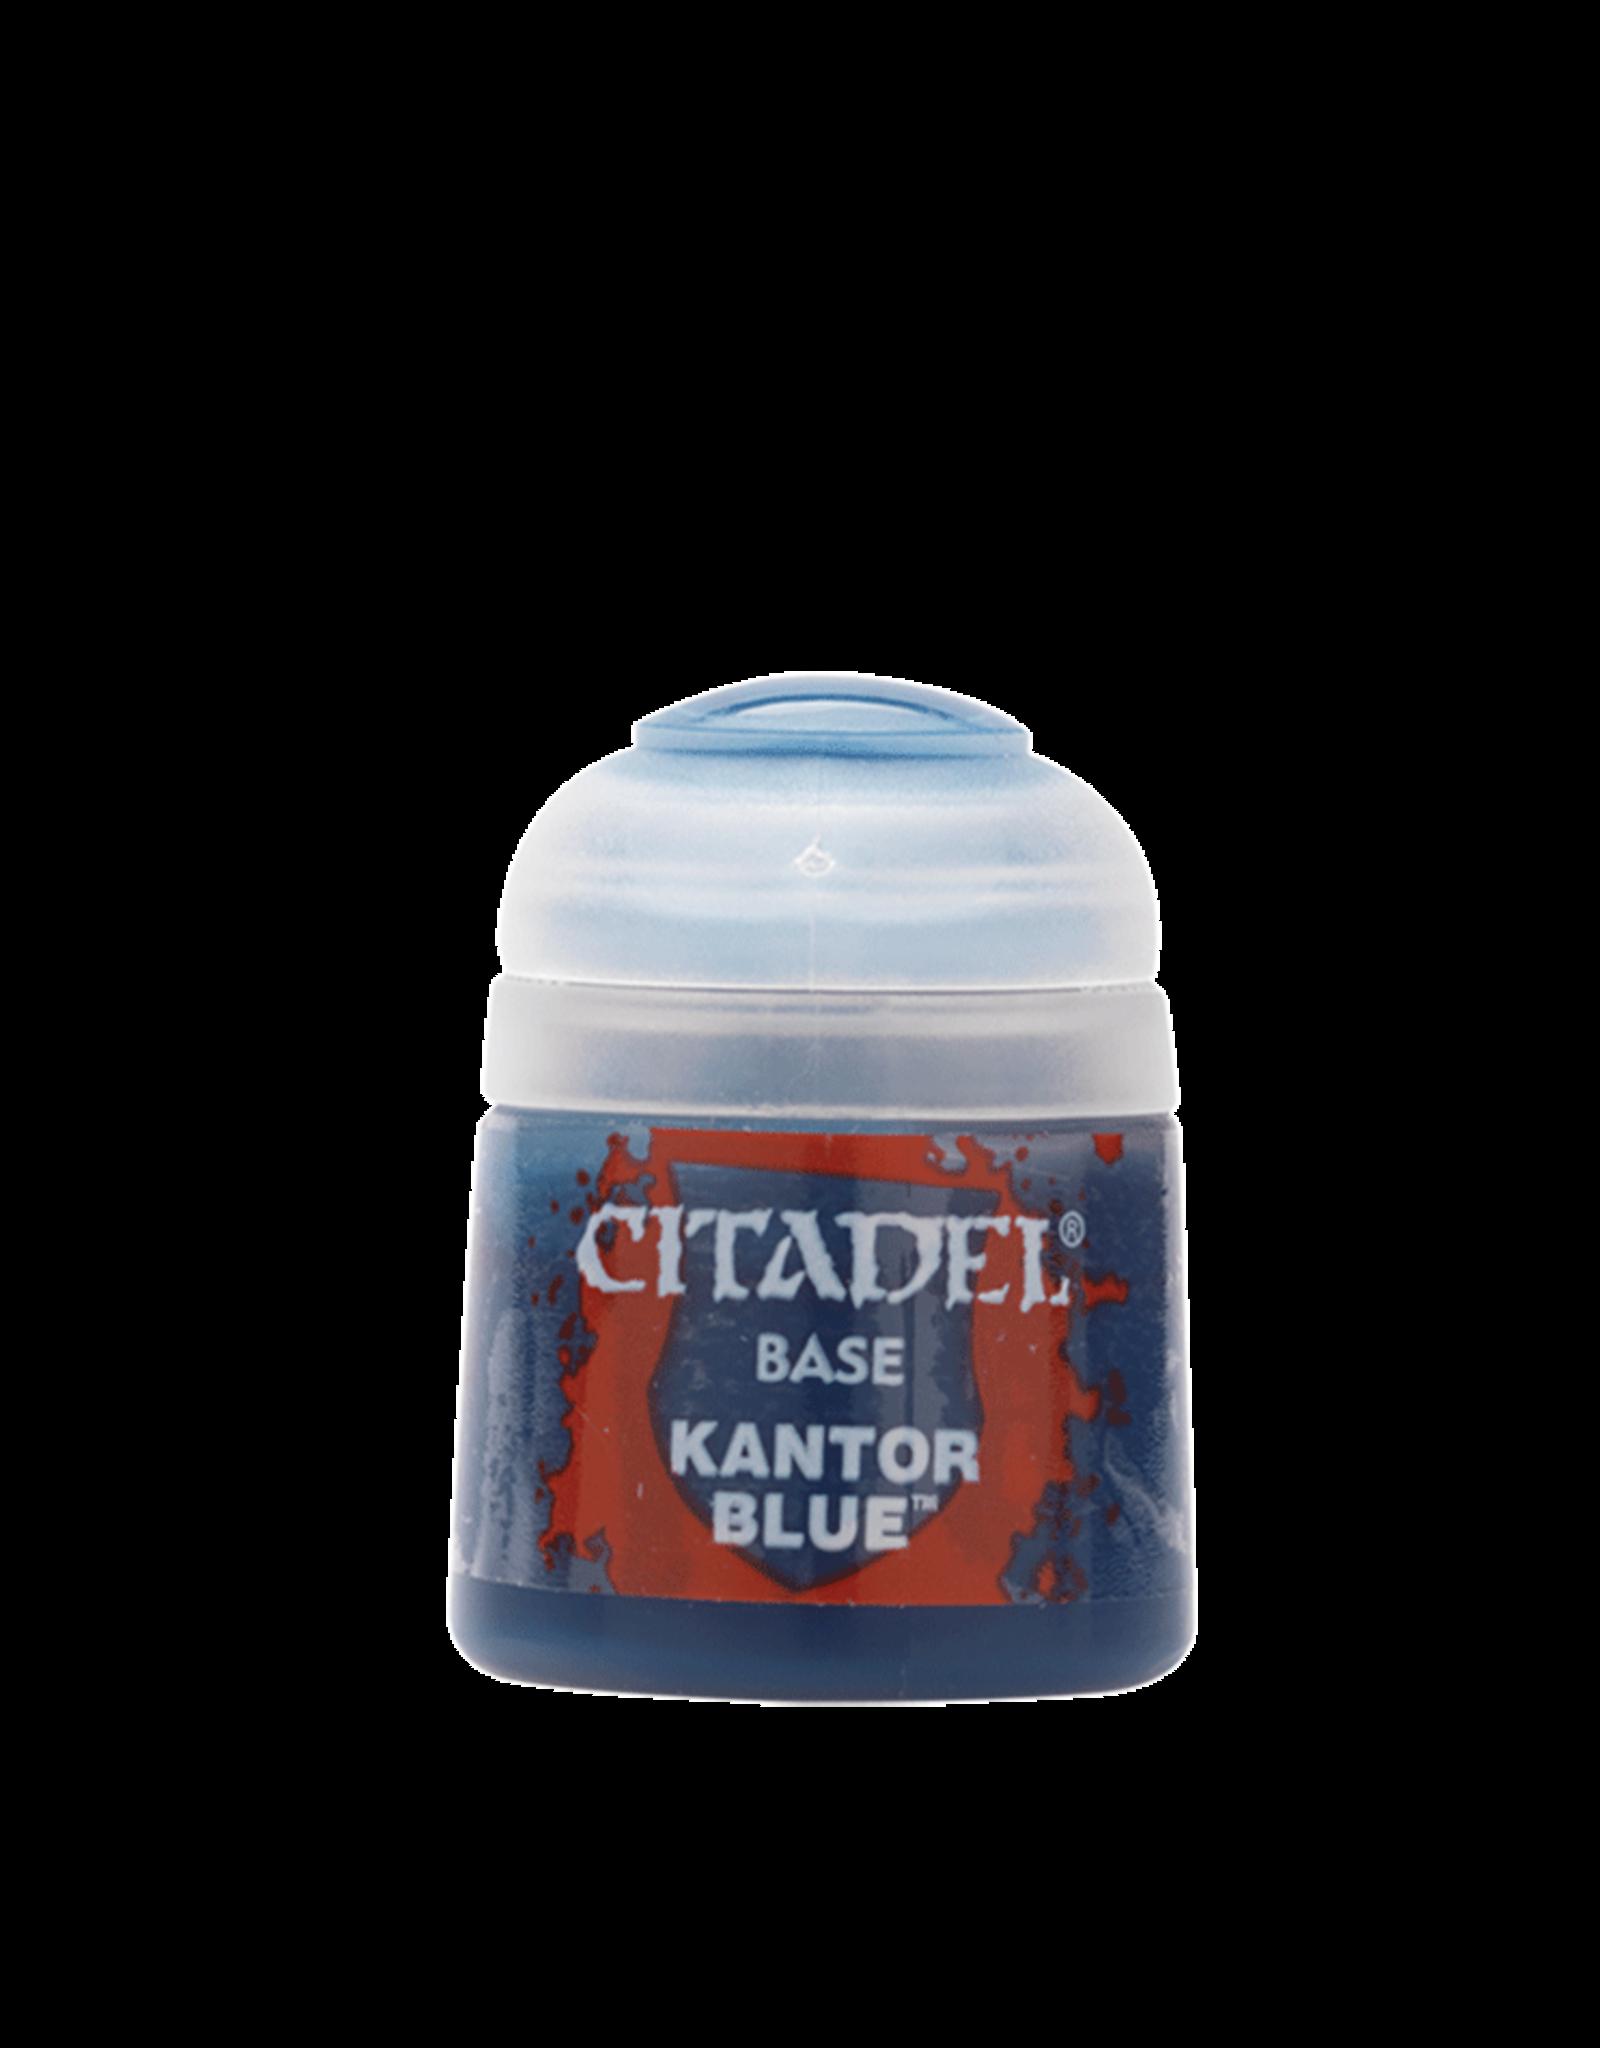 Citadel Citadel Base: Kantor Blue (12ml)